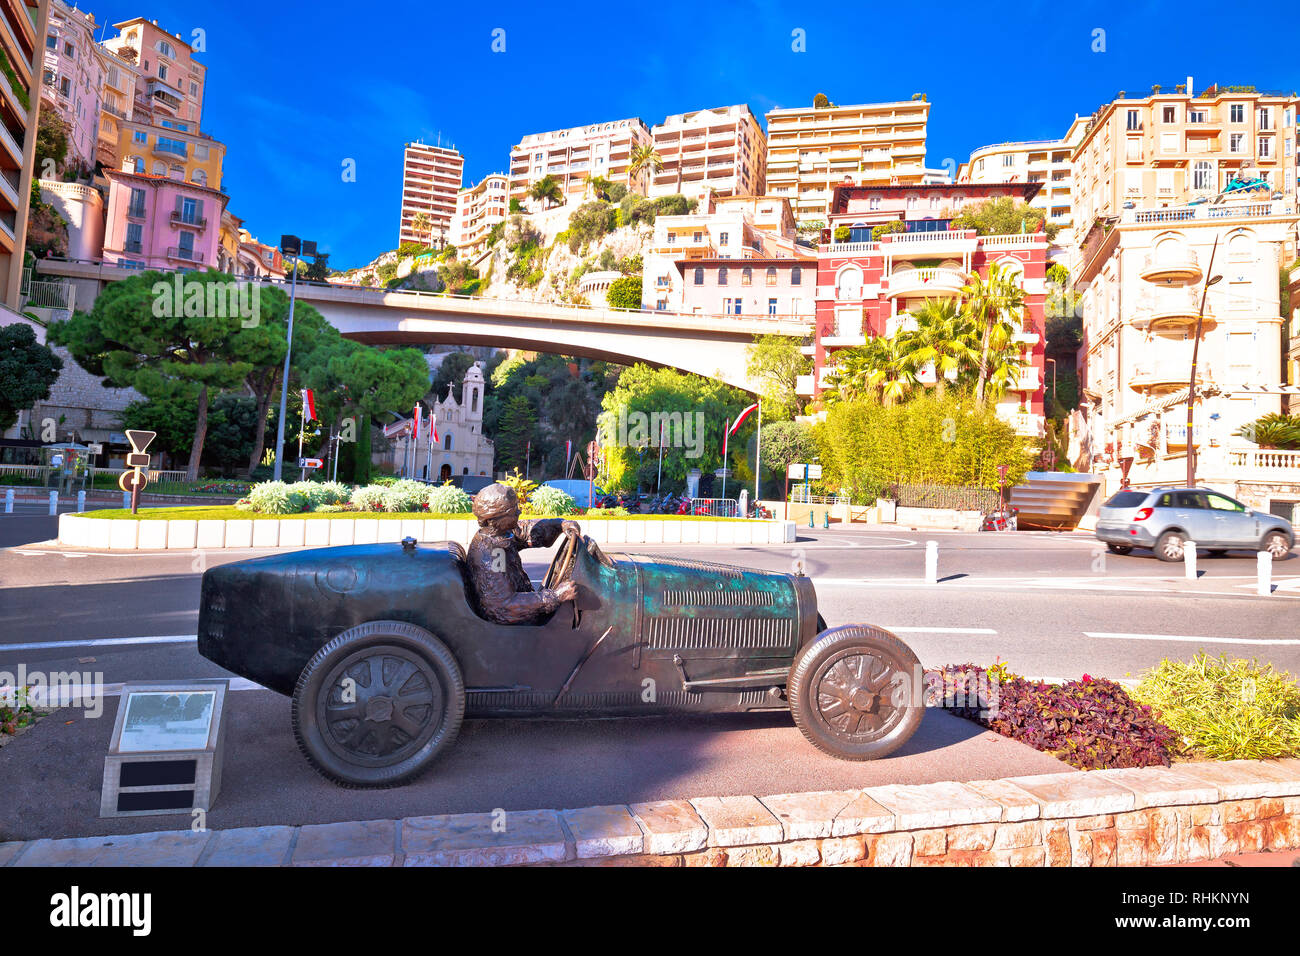 Monaco city street and landmarks view, Principality of Monaco - Stock Image